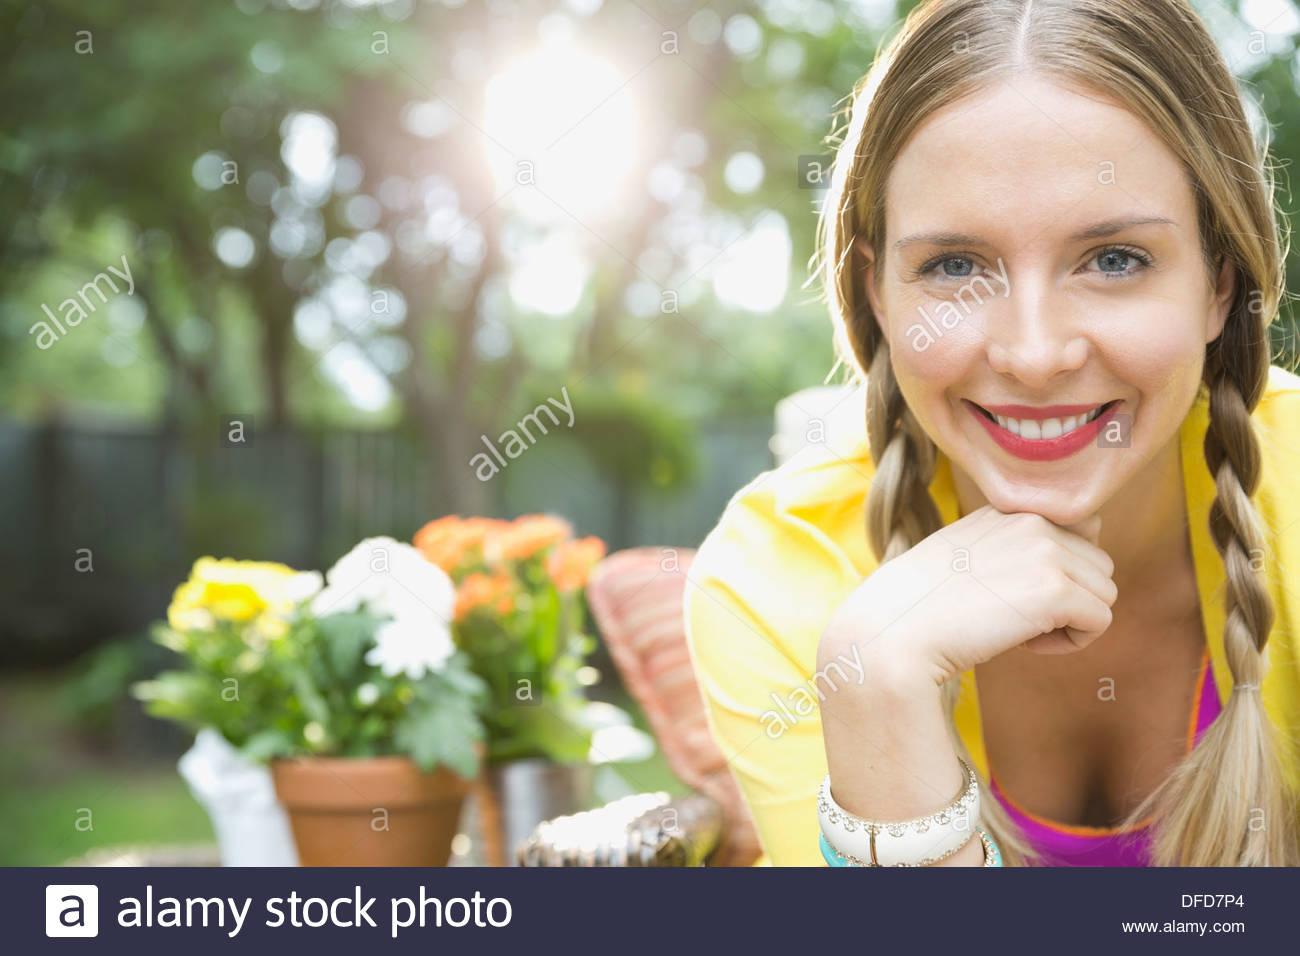 Portrait of beautiful woman in yard - Stock Image